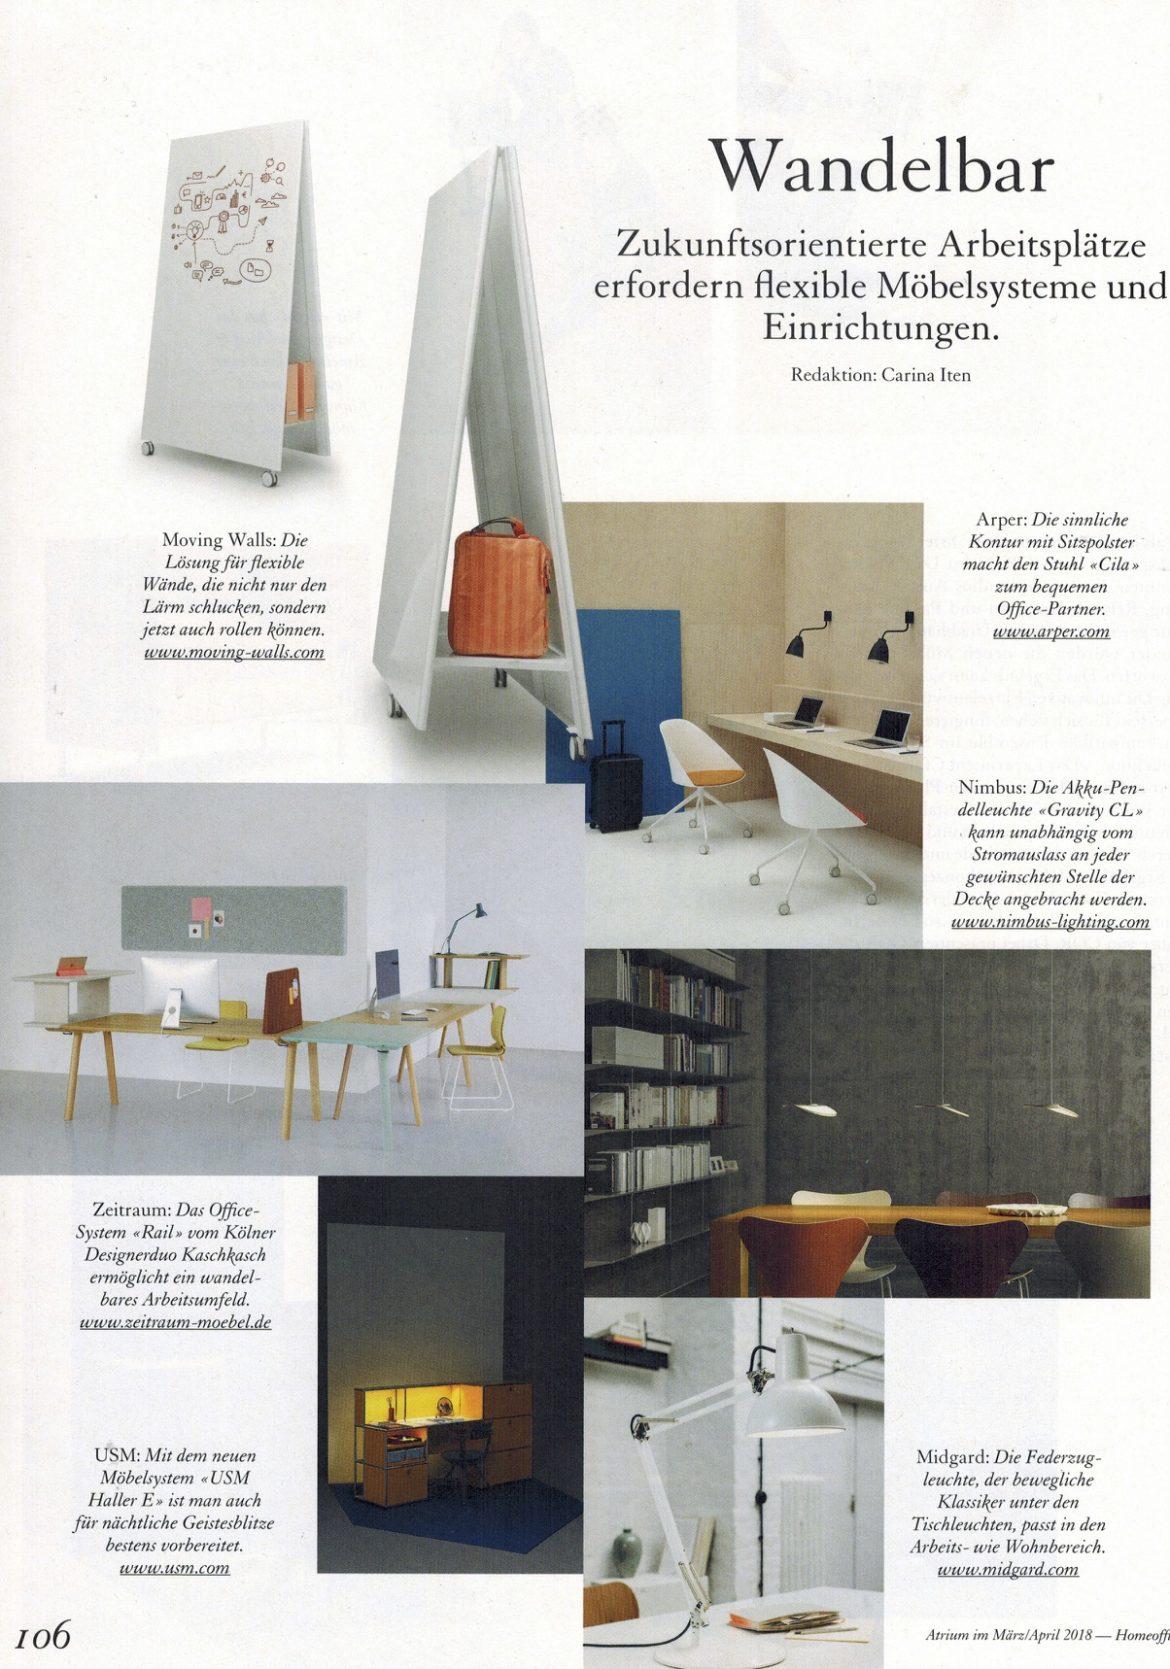 Moving Walls in Atrium – BRAND. KIOSK | COMMUNICATION CONSULTANCY